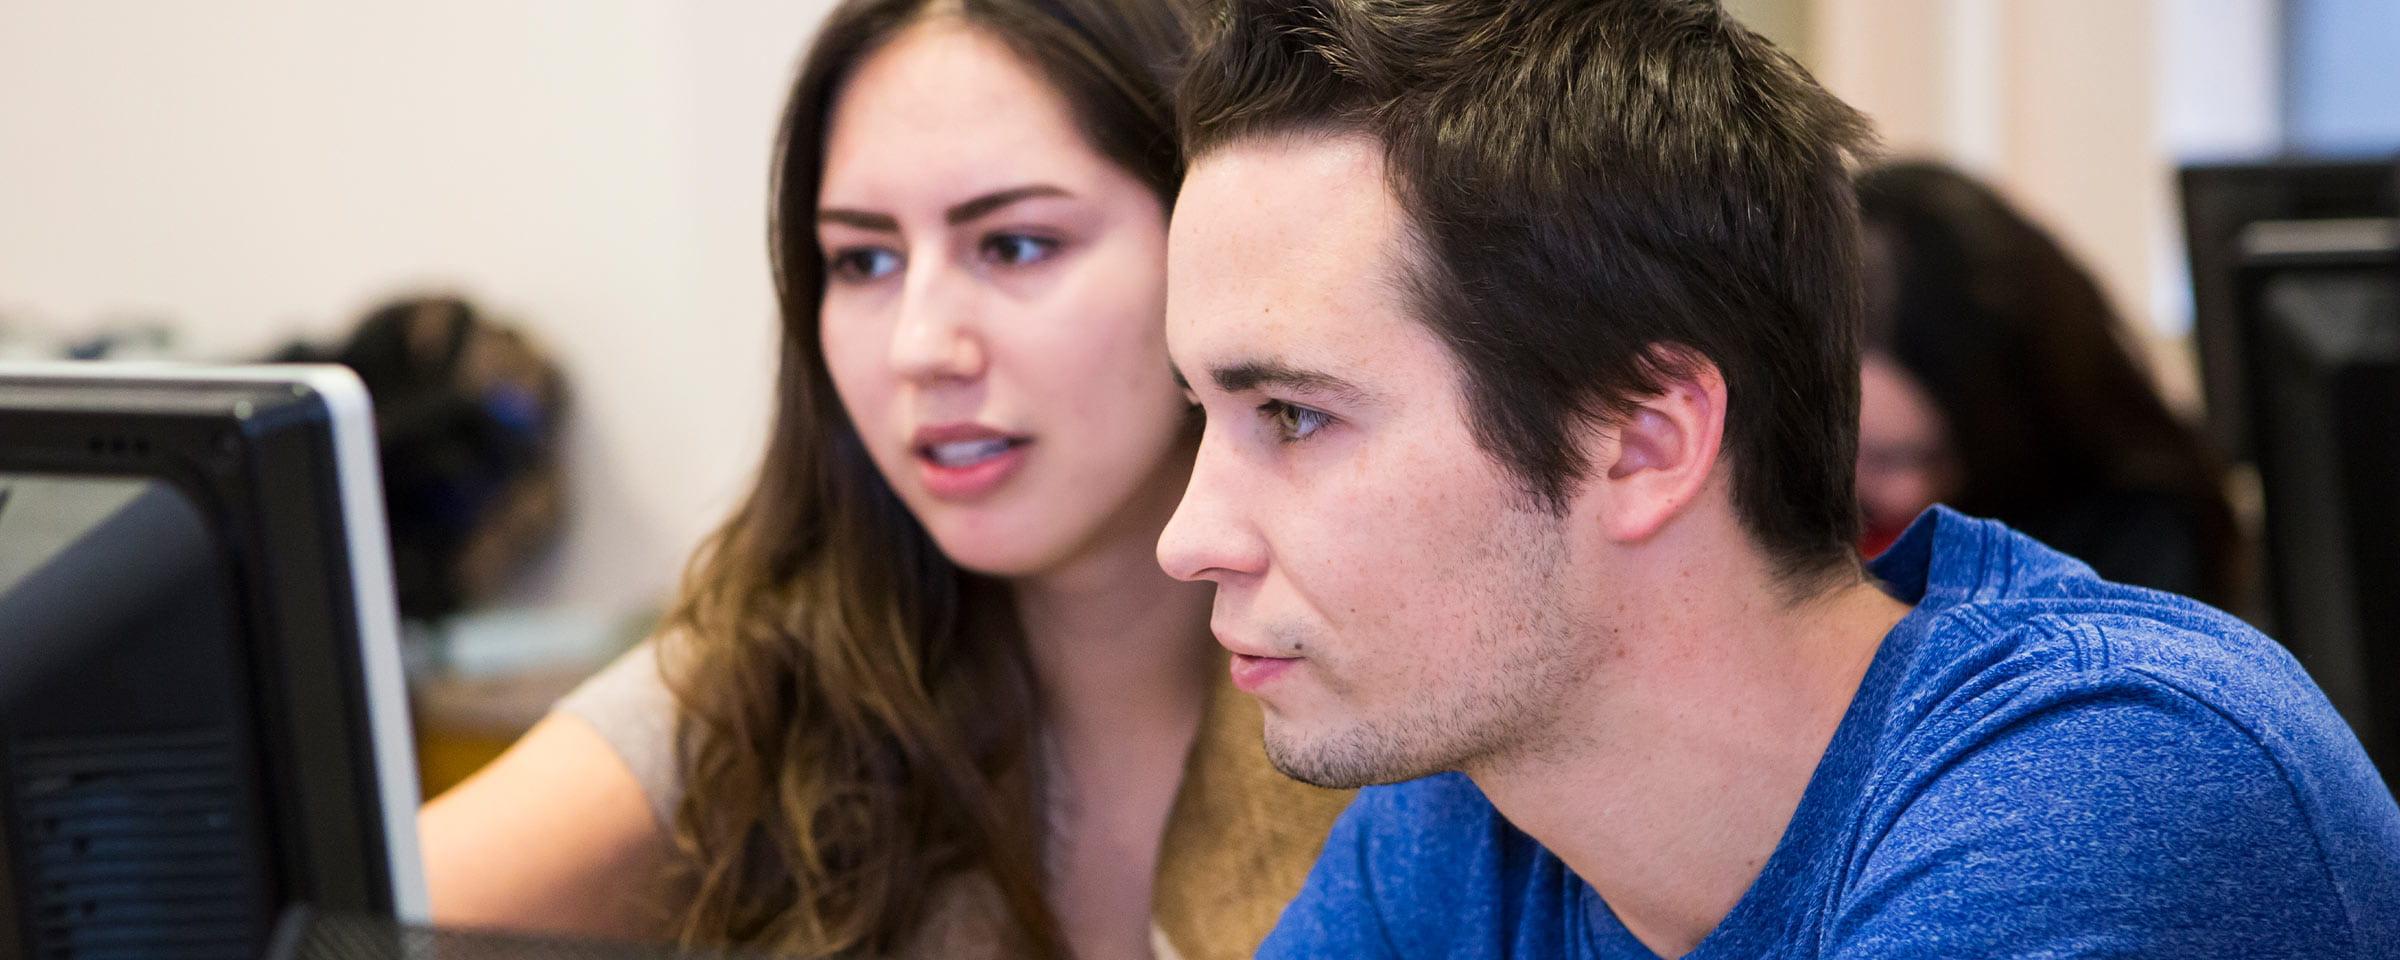 Young woman and man looking at computer screen